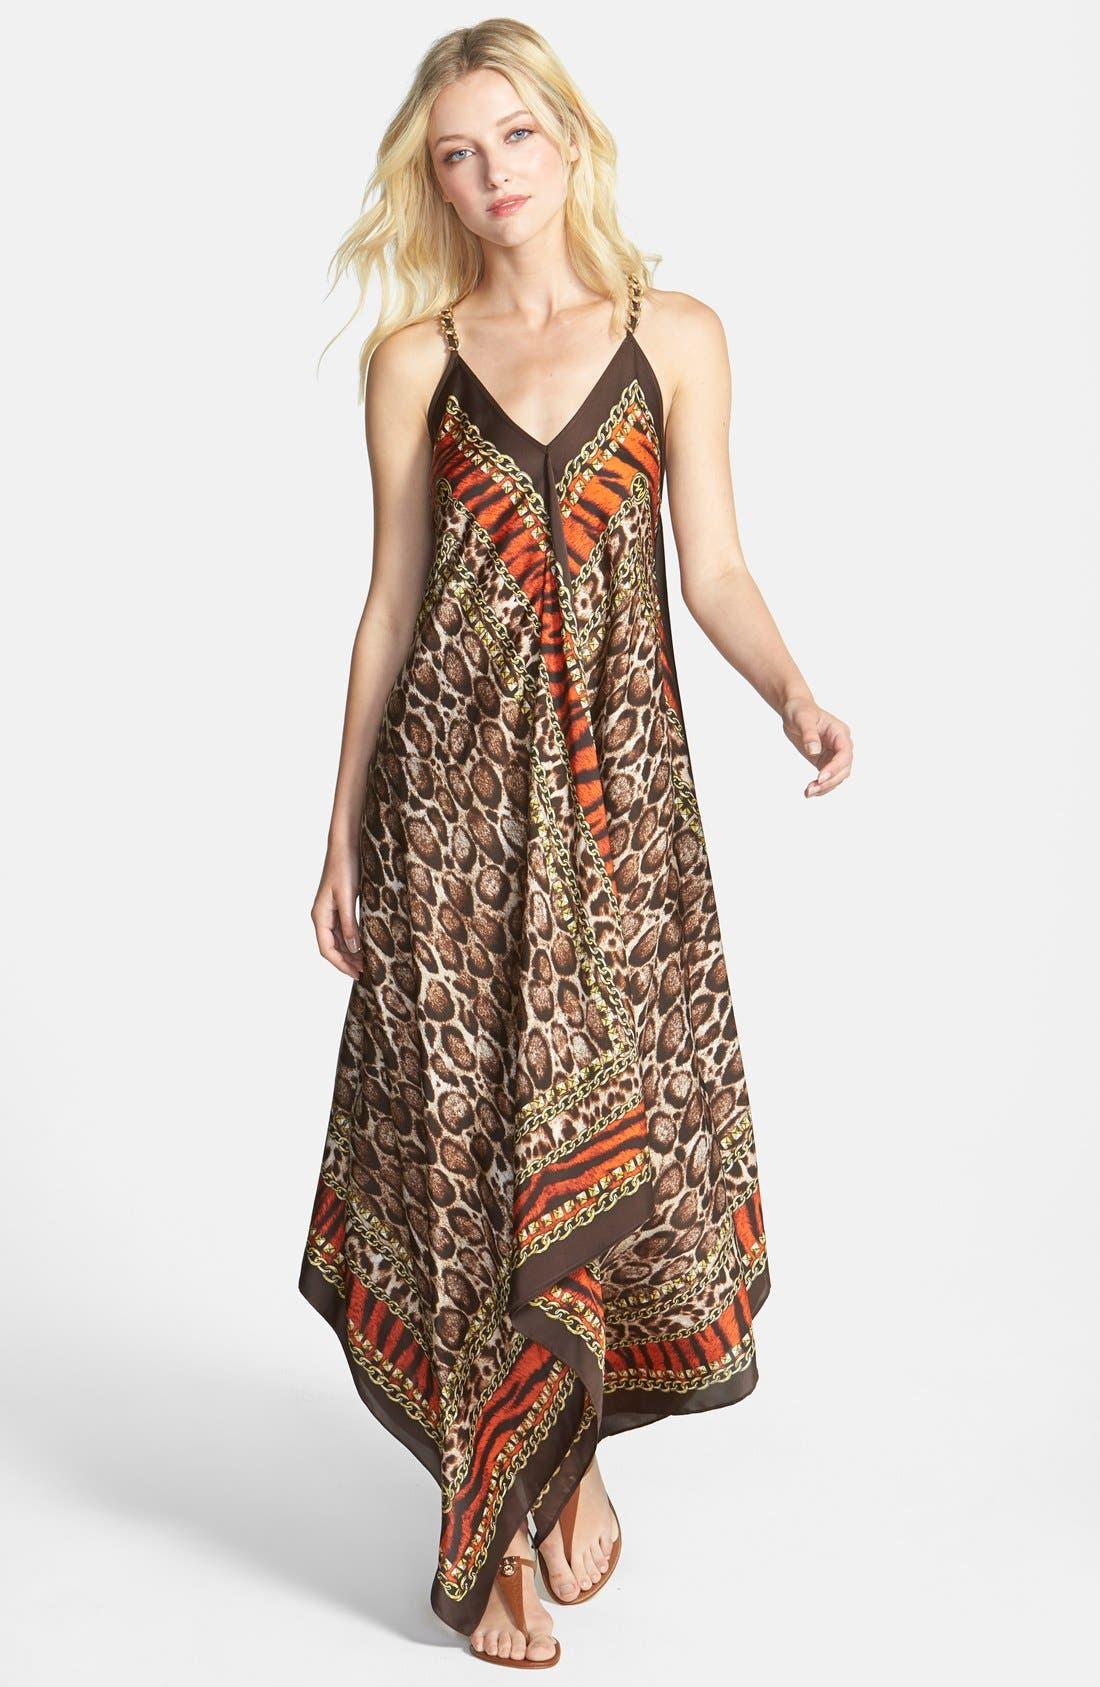 Main Image - MICHAEL Michael Kors 'Kasai' Scarf Print V-Neck Maxi Dress